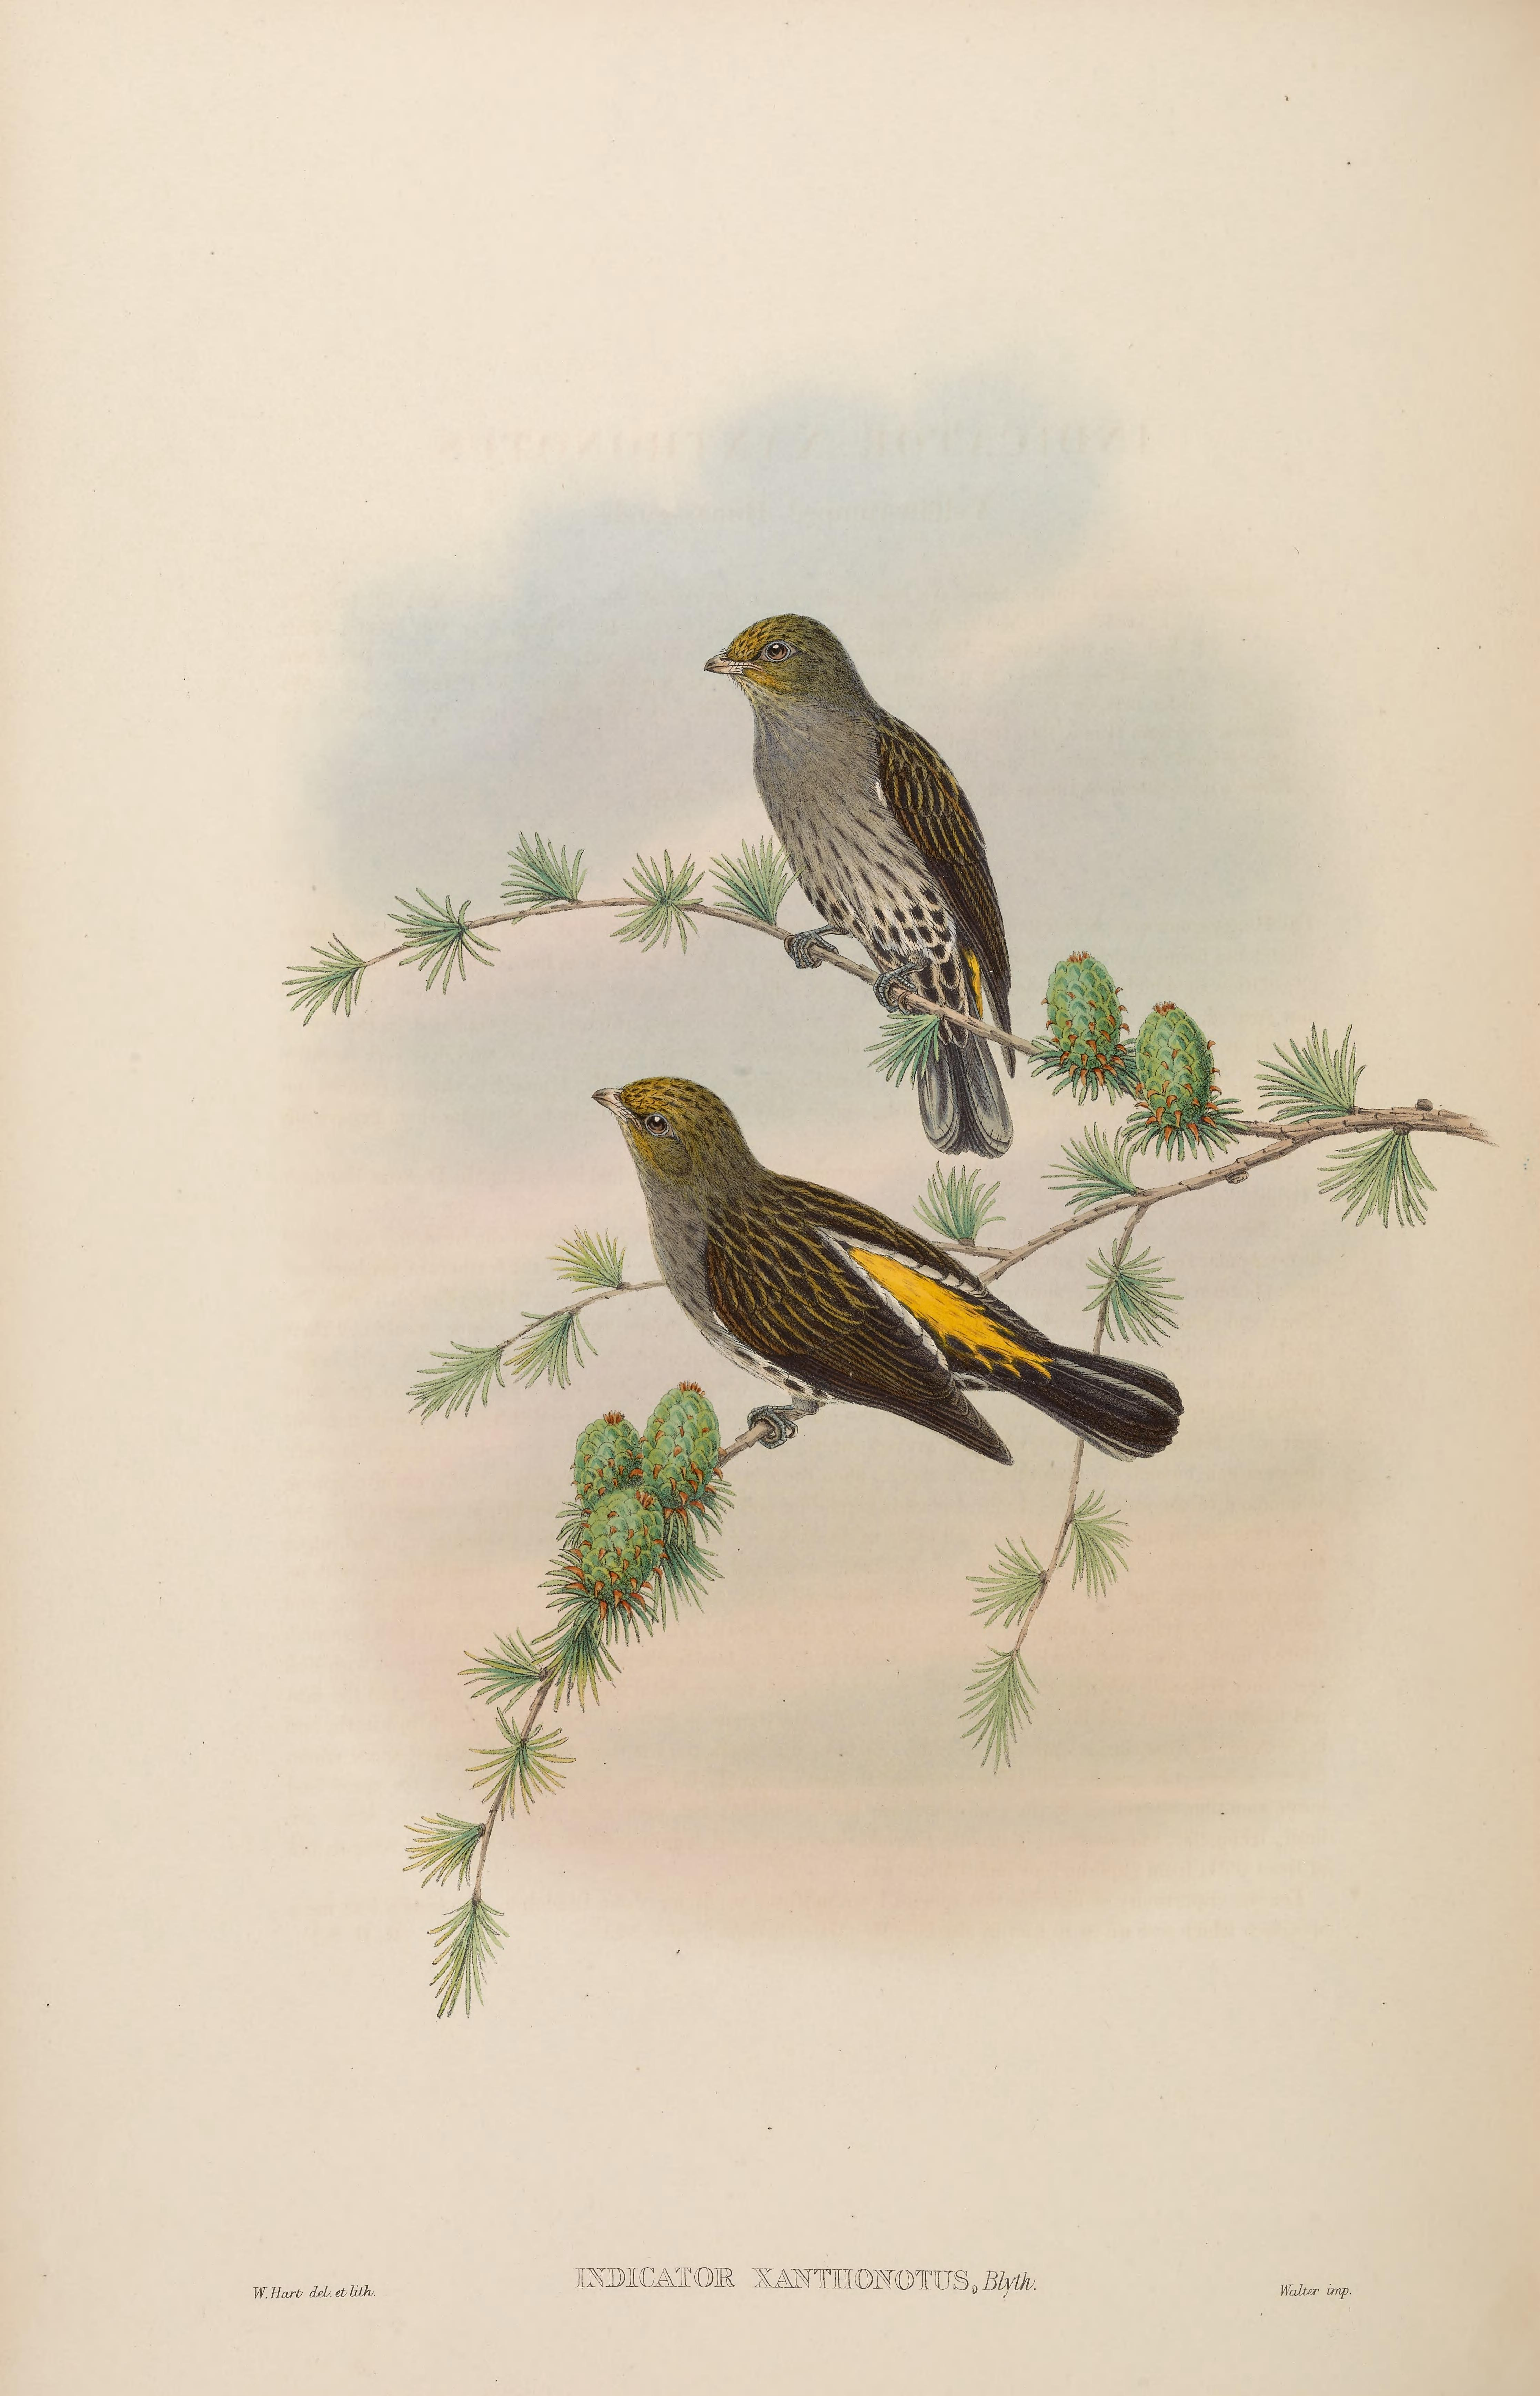 Image of Yellow-rumped Honeyguide